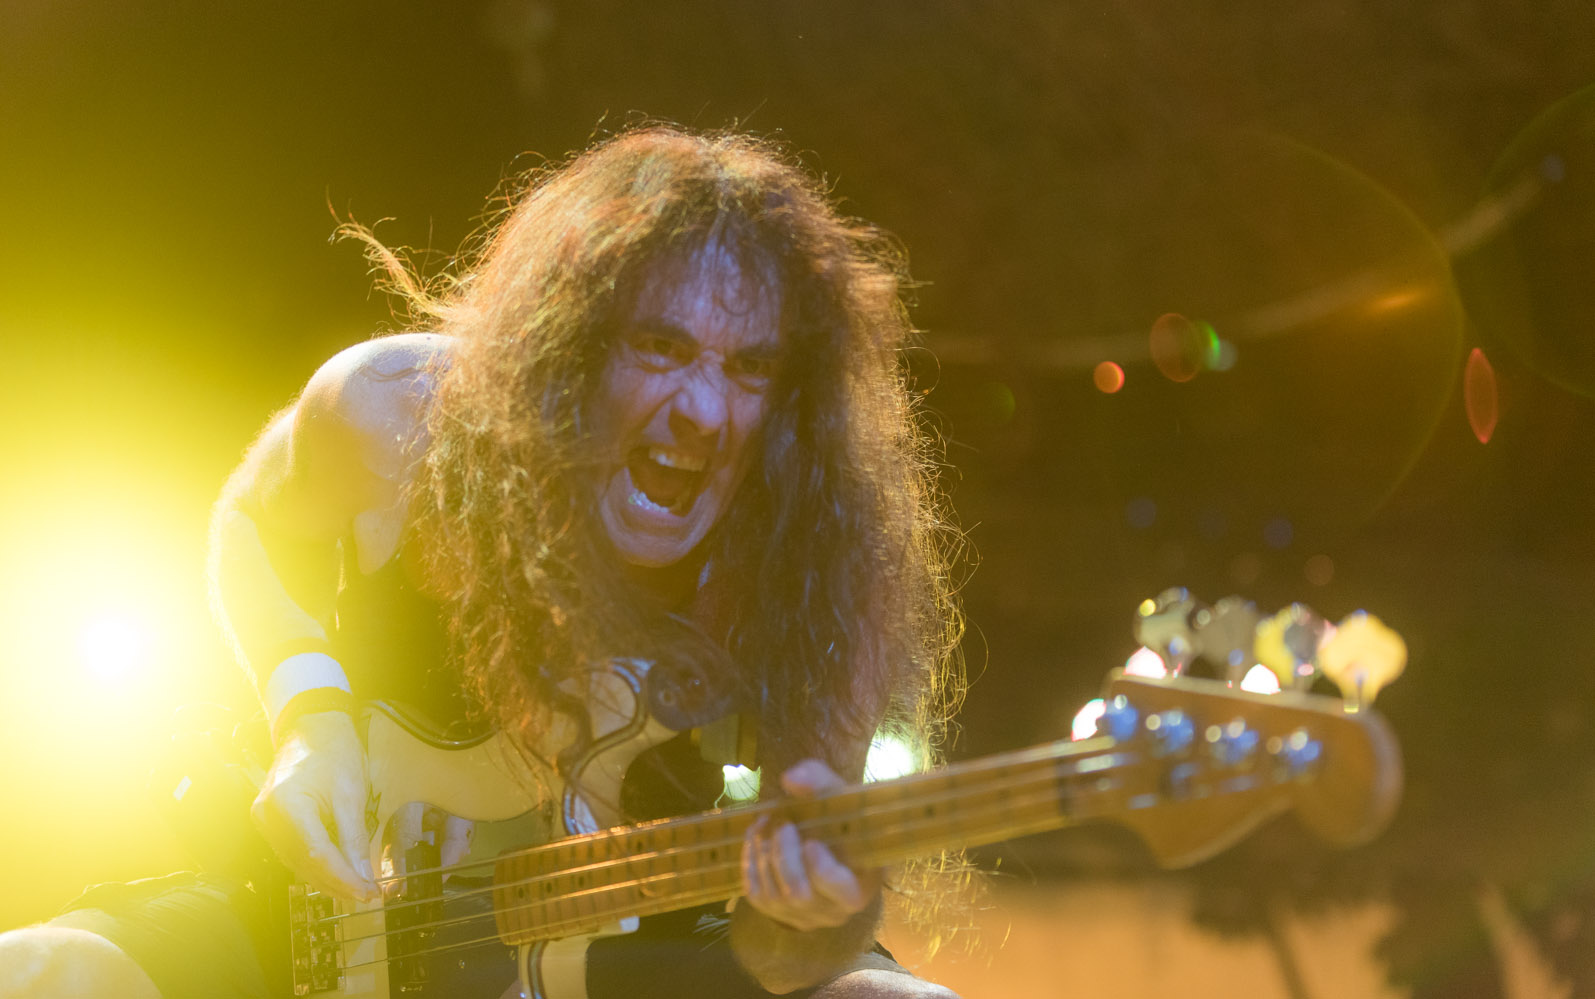 Steve Harris, baixista da banda inglesa Iron Maiden, durante show no ginásio Nilson Nelson, em Brasília, na noite de terça (22)